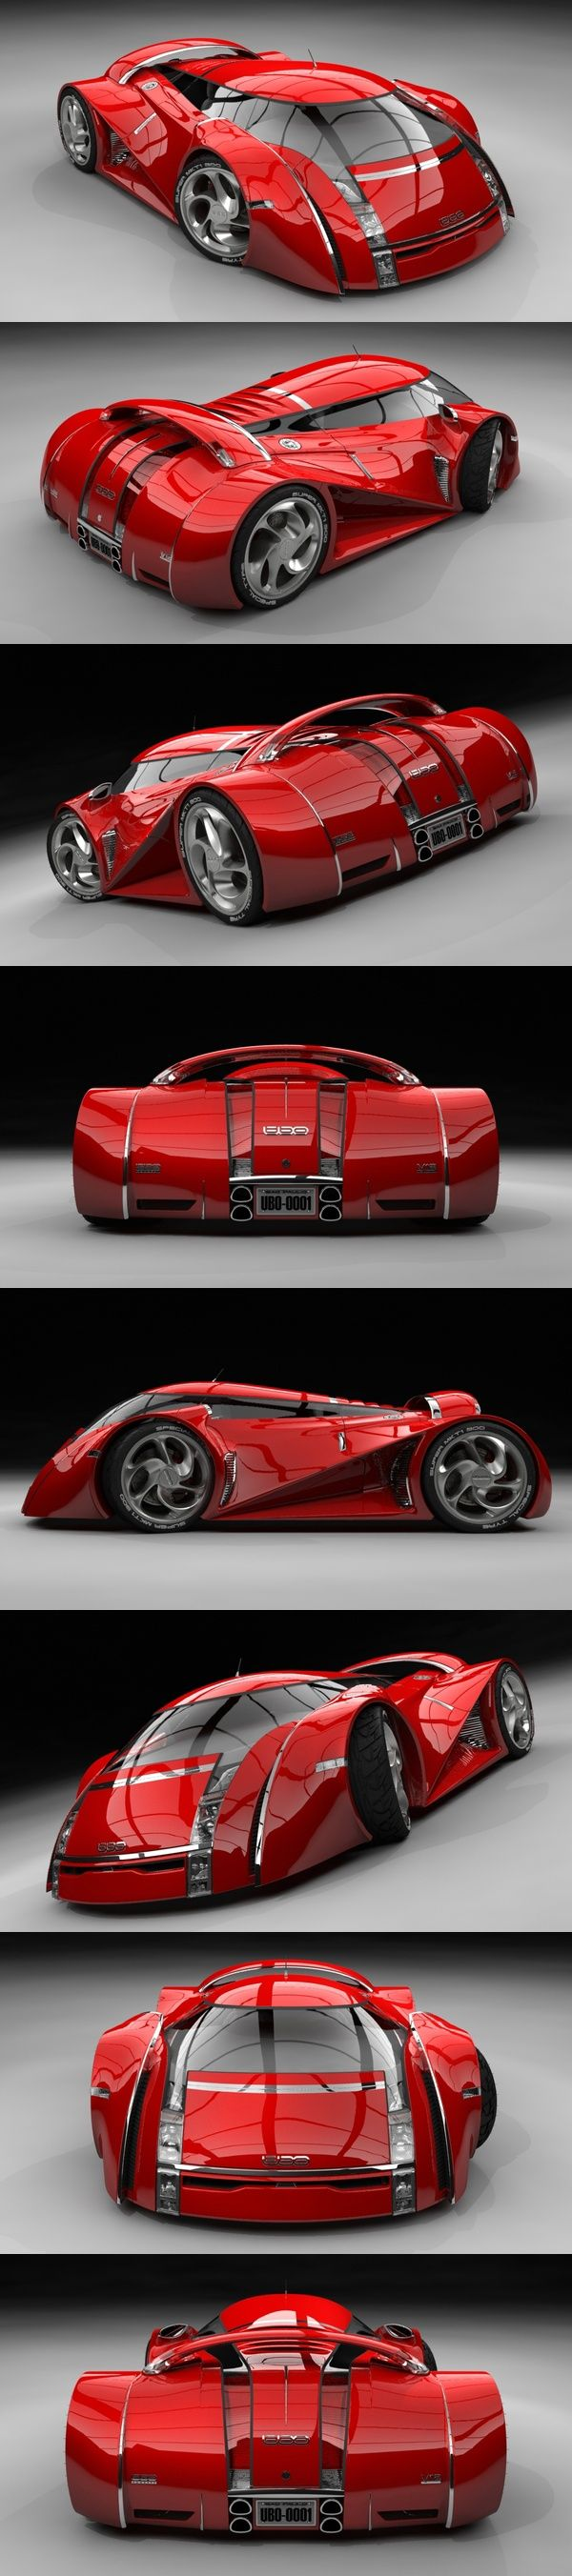 38 Pretty Photo Bugatti https://www.amazon.co.uk/Baby-Car-Mirror-Shatterproof-Installation/dp/B06XHG6SSY/ref=sr_1_2?ie=UTF8&qid=1499074433&sr=8-2&keywords=Kingseye